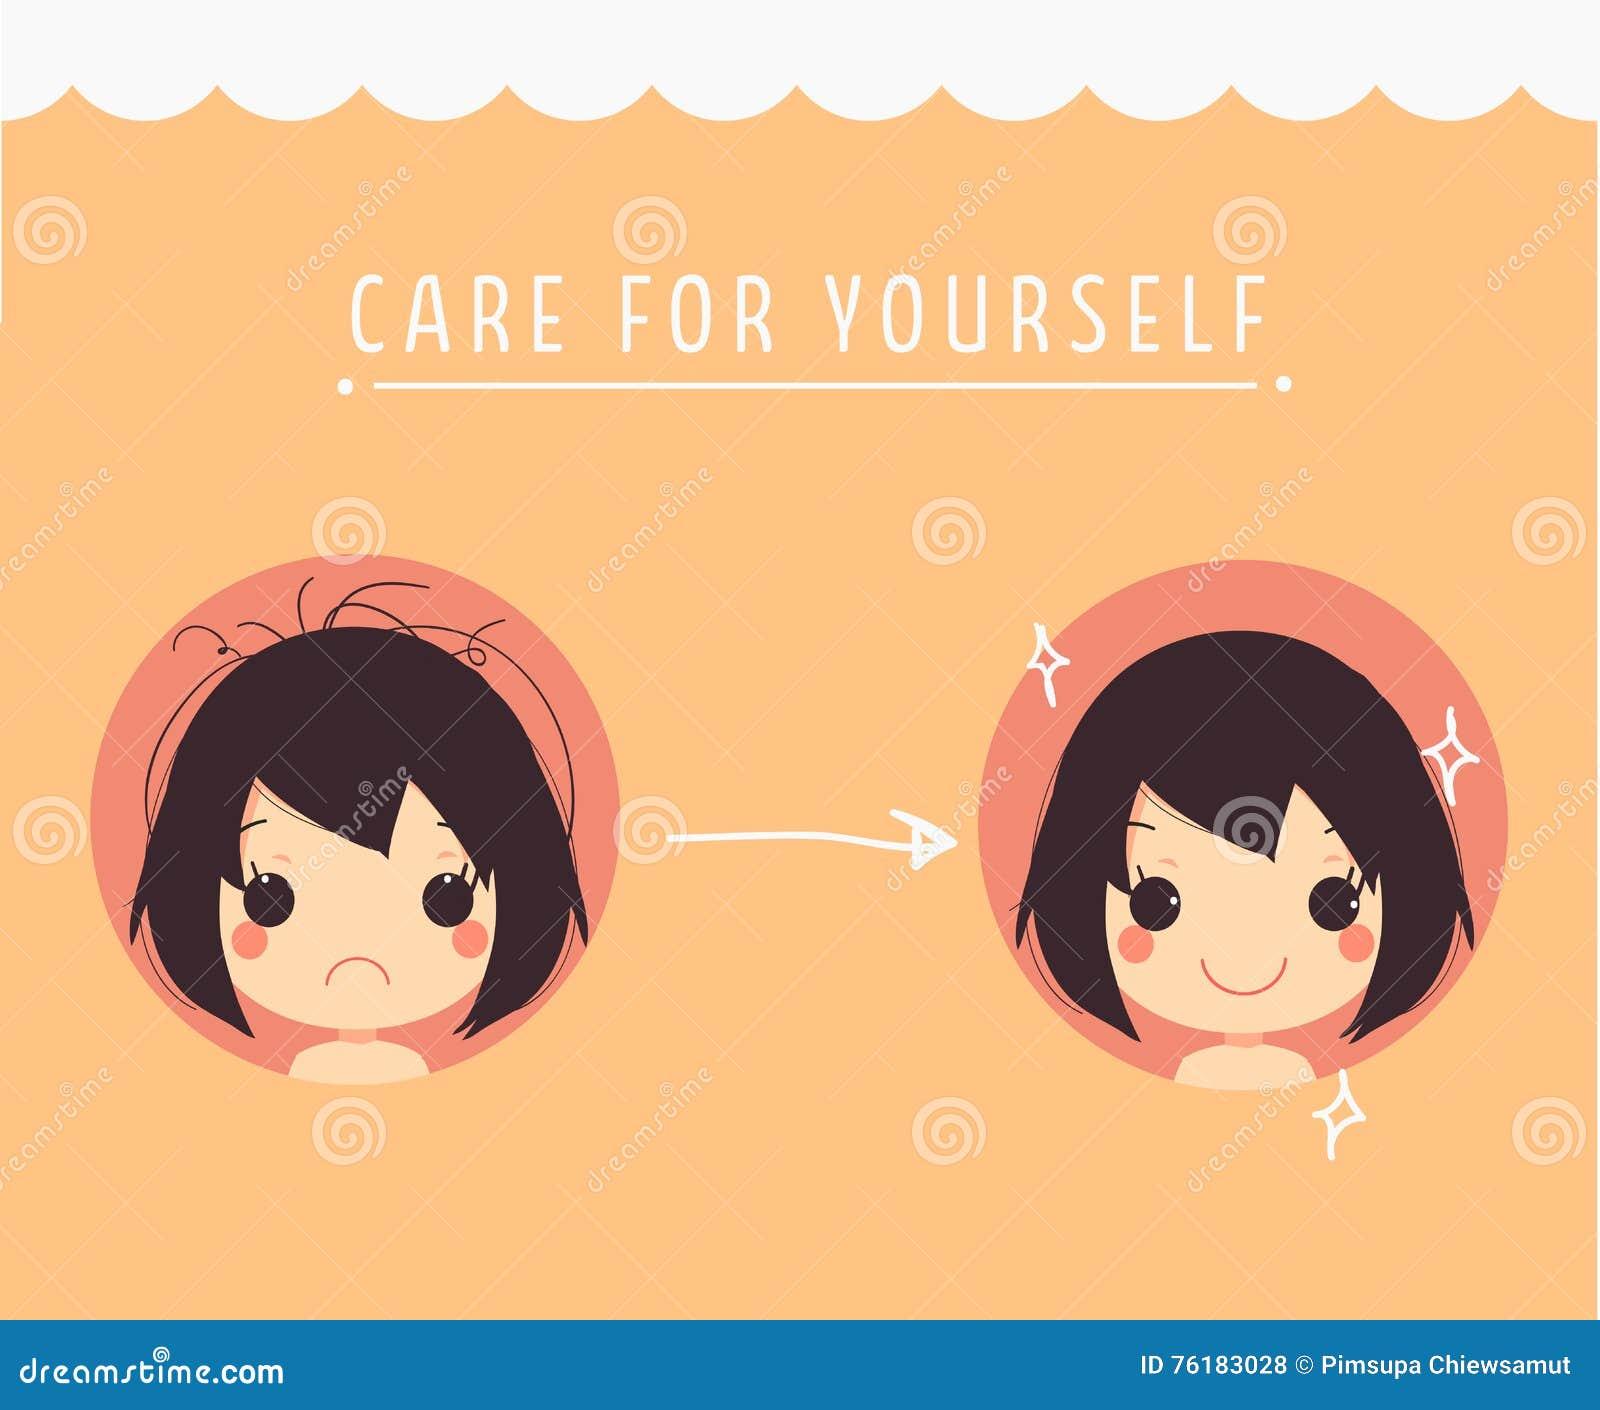 Cute Girl Messy Hair Silky Hair Care For Yourself Stock Vector